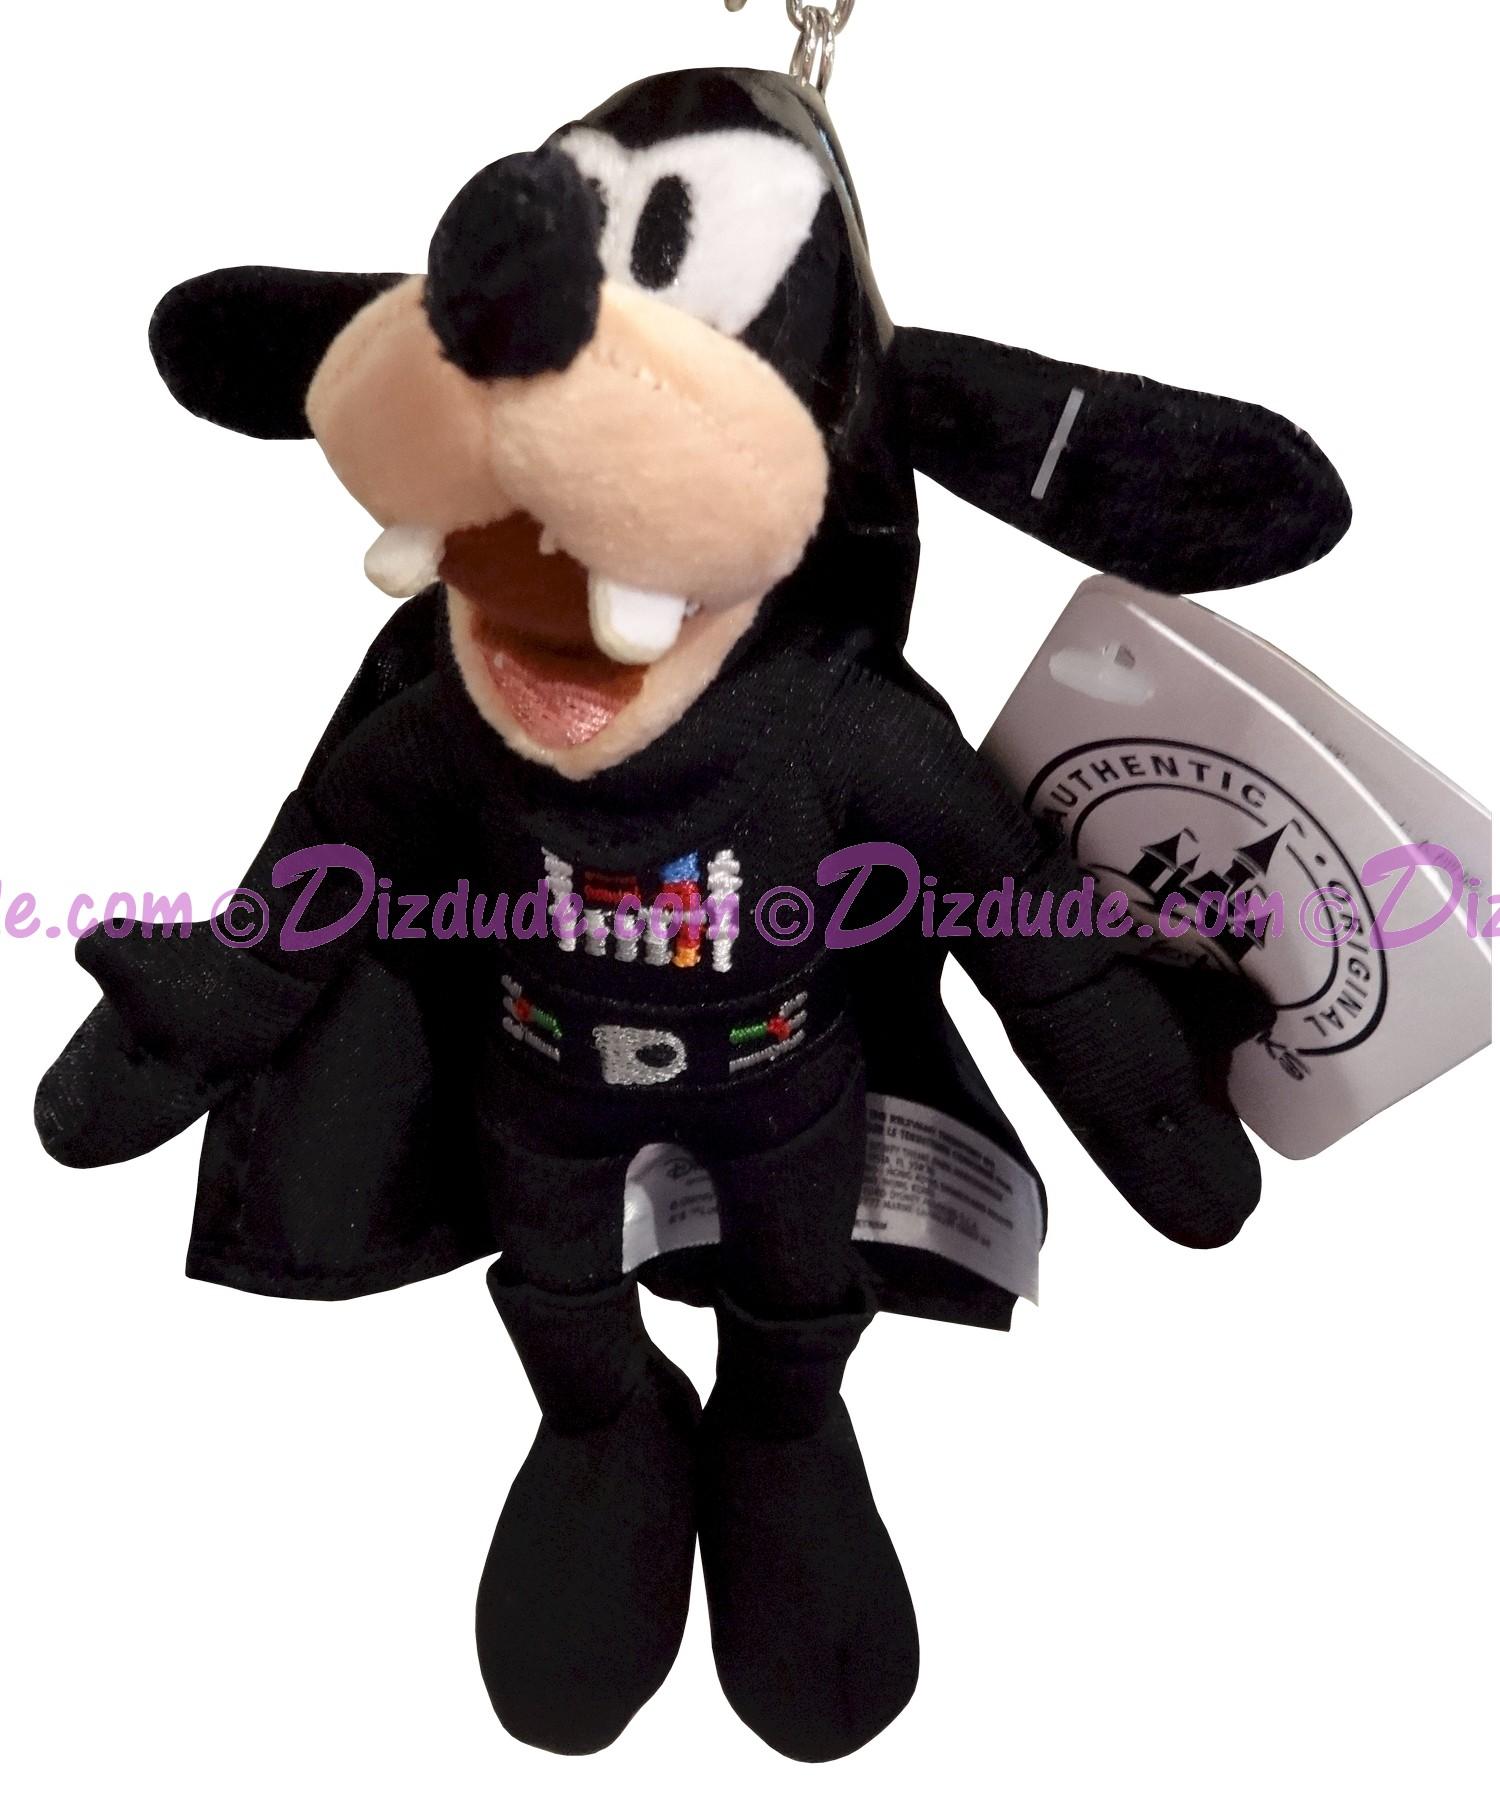 Disney Star Wars Goofy As Darth Vader Plush Key Chain Or Christmas Ornament  © Dizdude